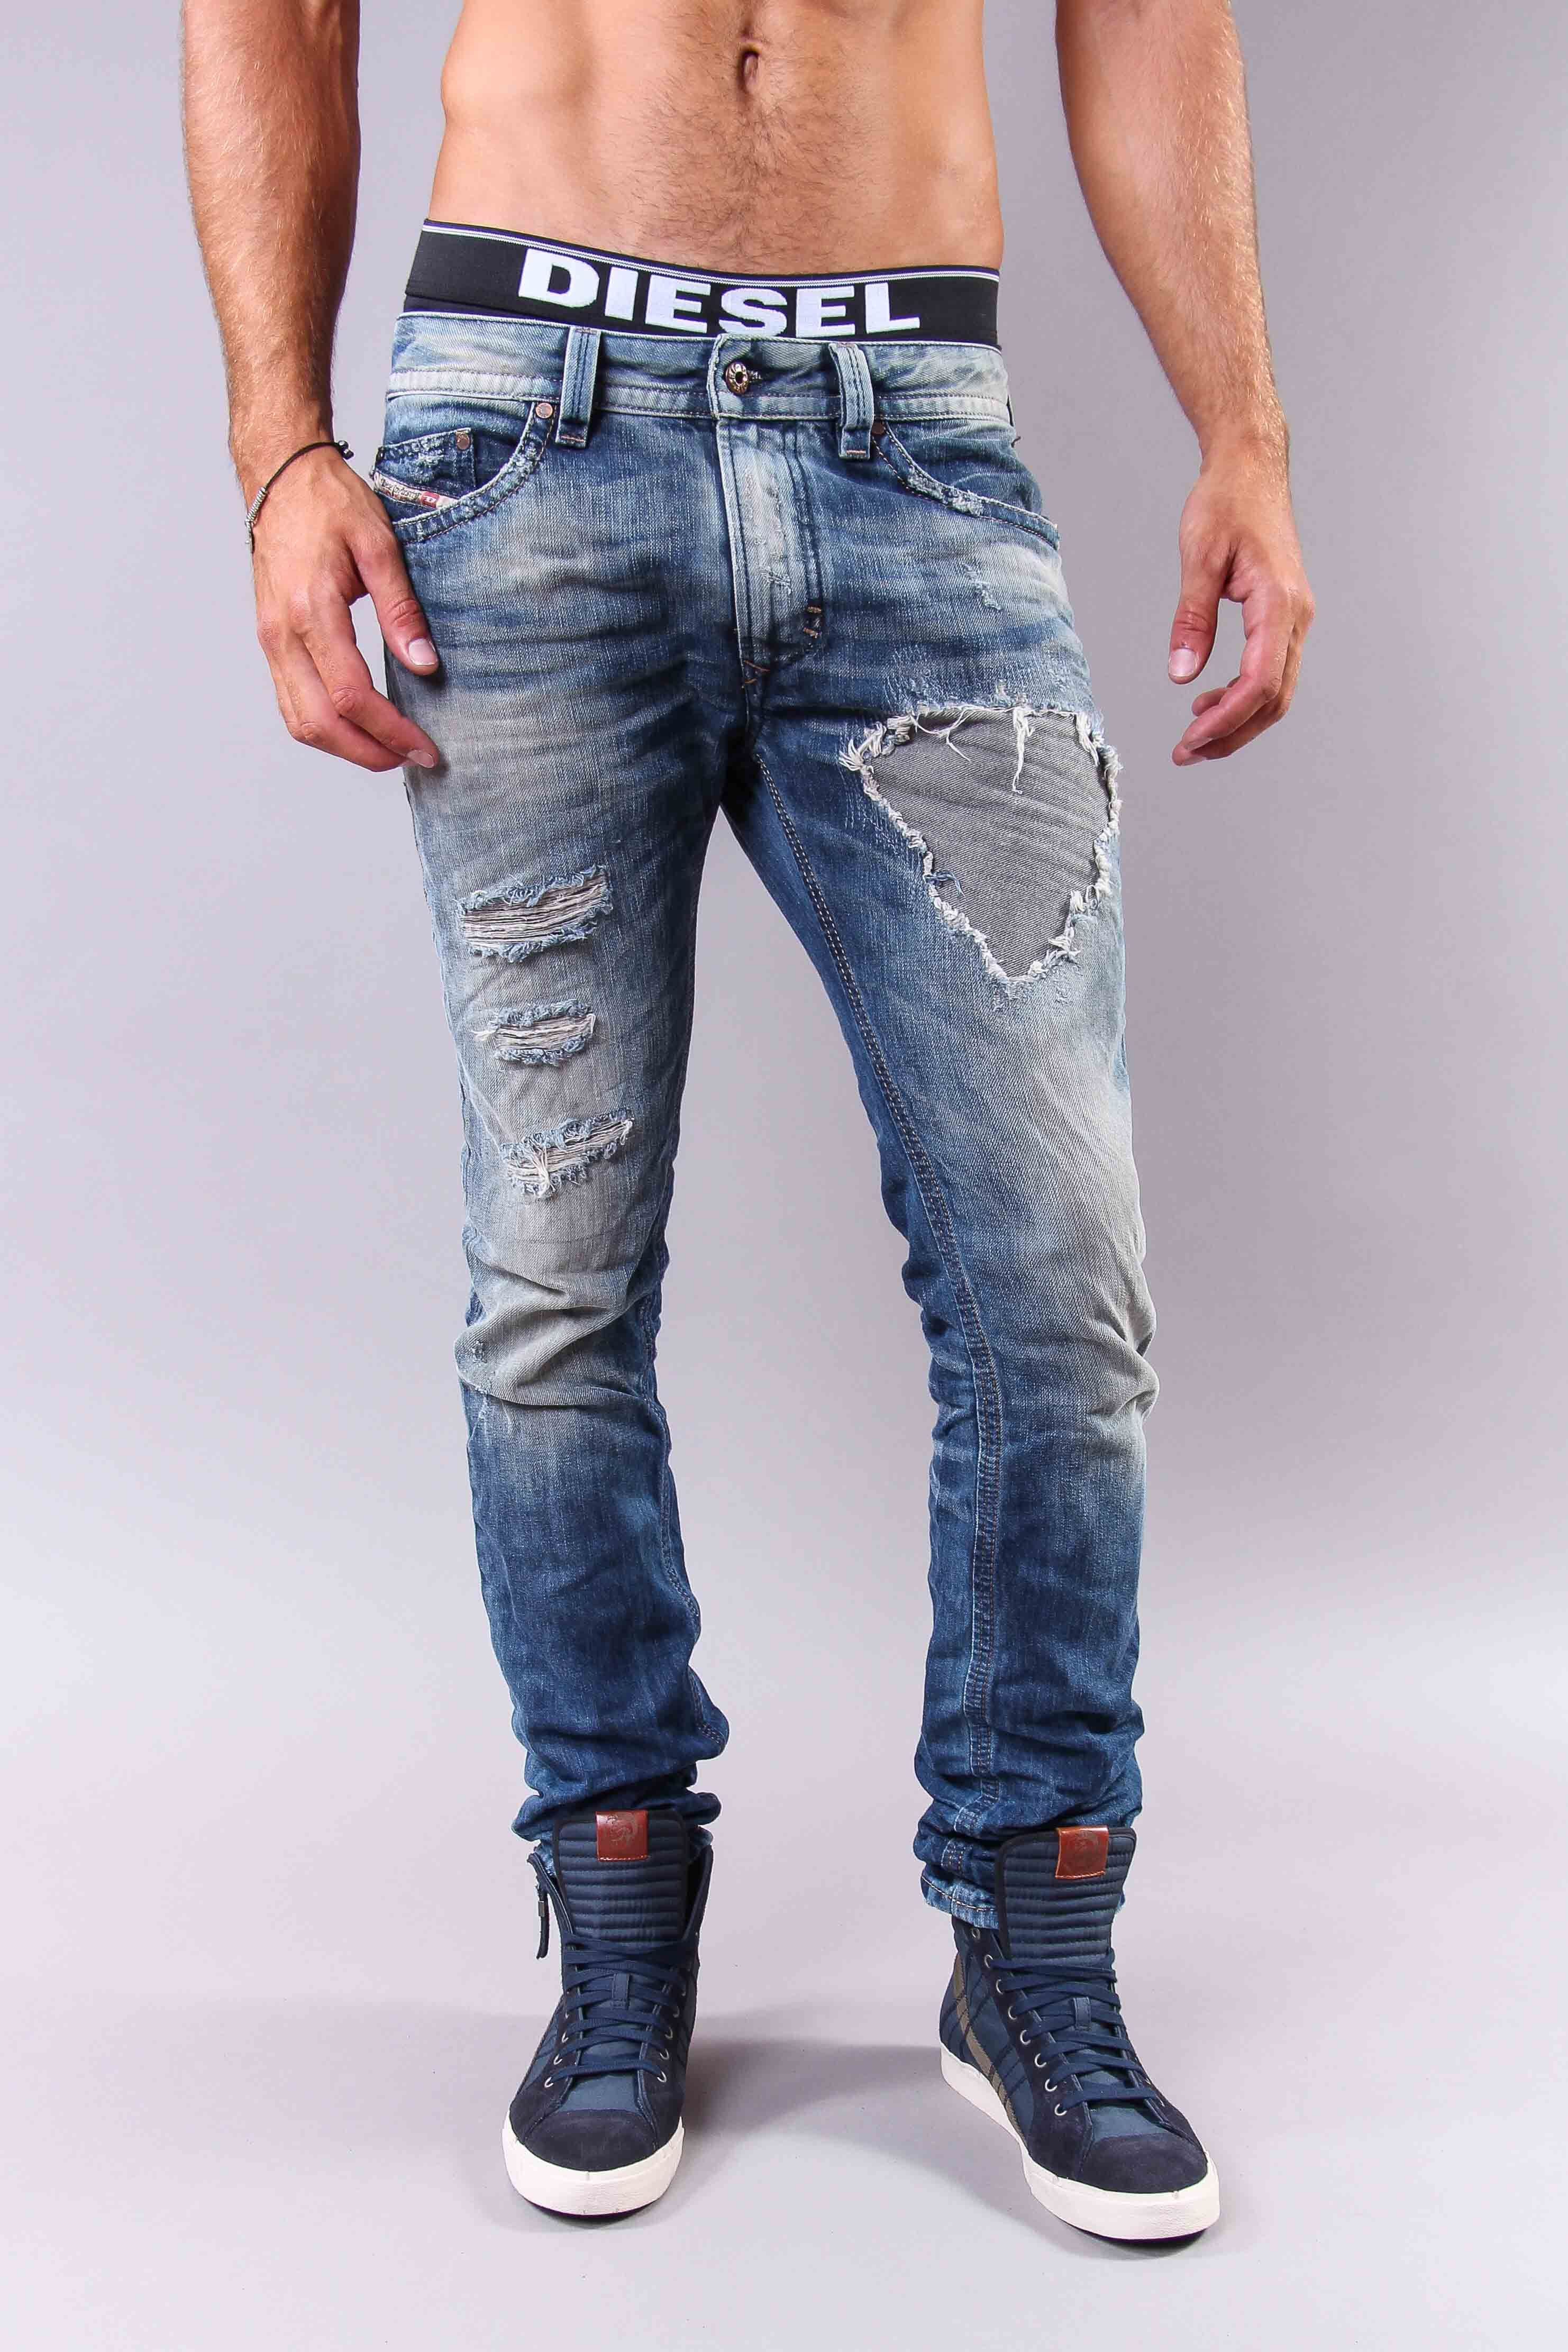 Man Jeans, Men Pants, Denim Jeans, Blue Jeans, Diesel Style, Diesel Jeans,  Men Casual, Casual Outfits, Bodo